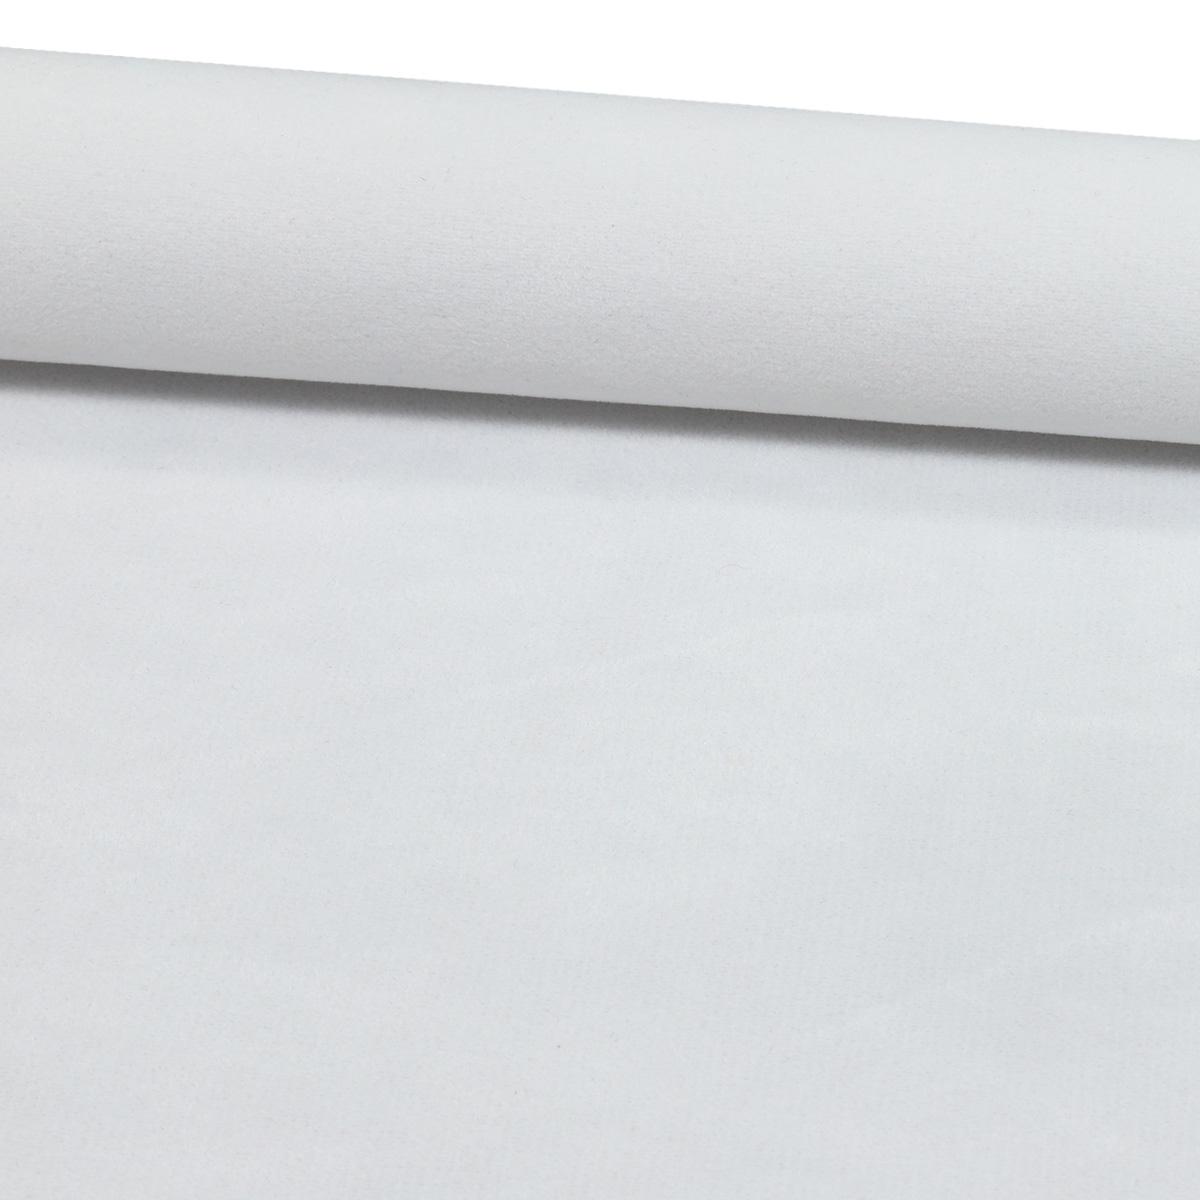 Замша 20*30см искуственная двухсторонняя, 2 листа